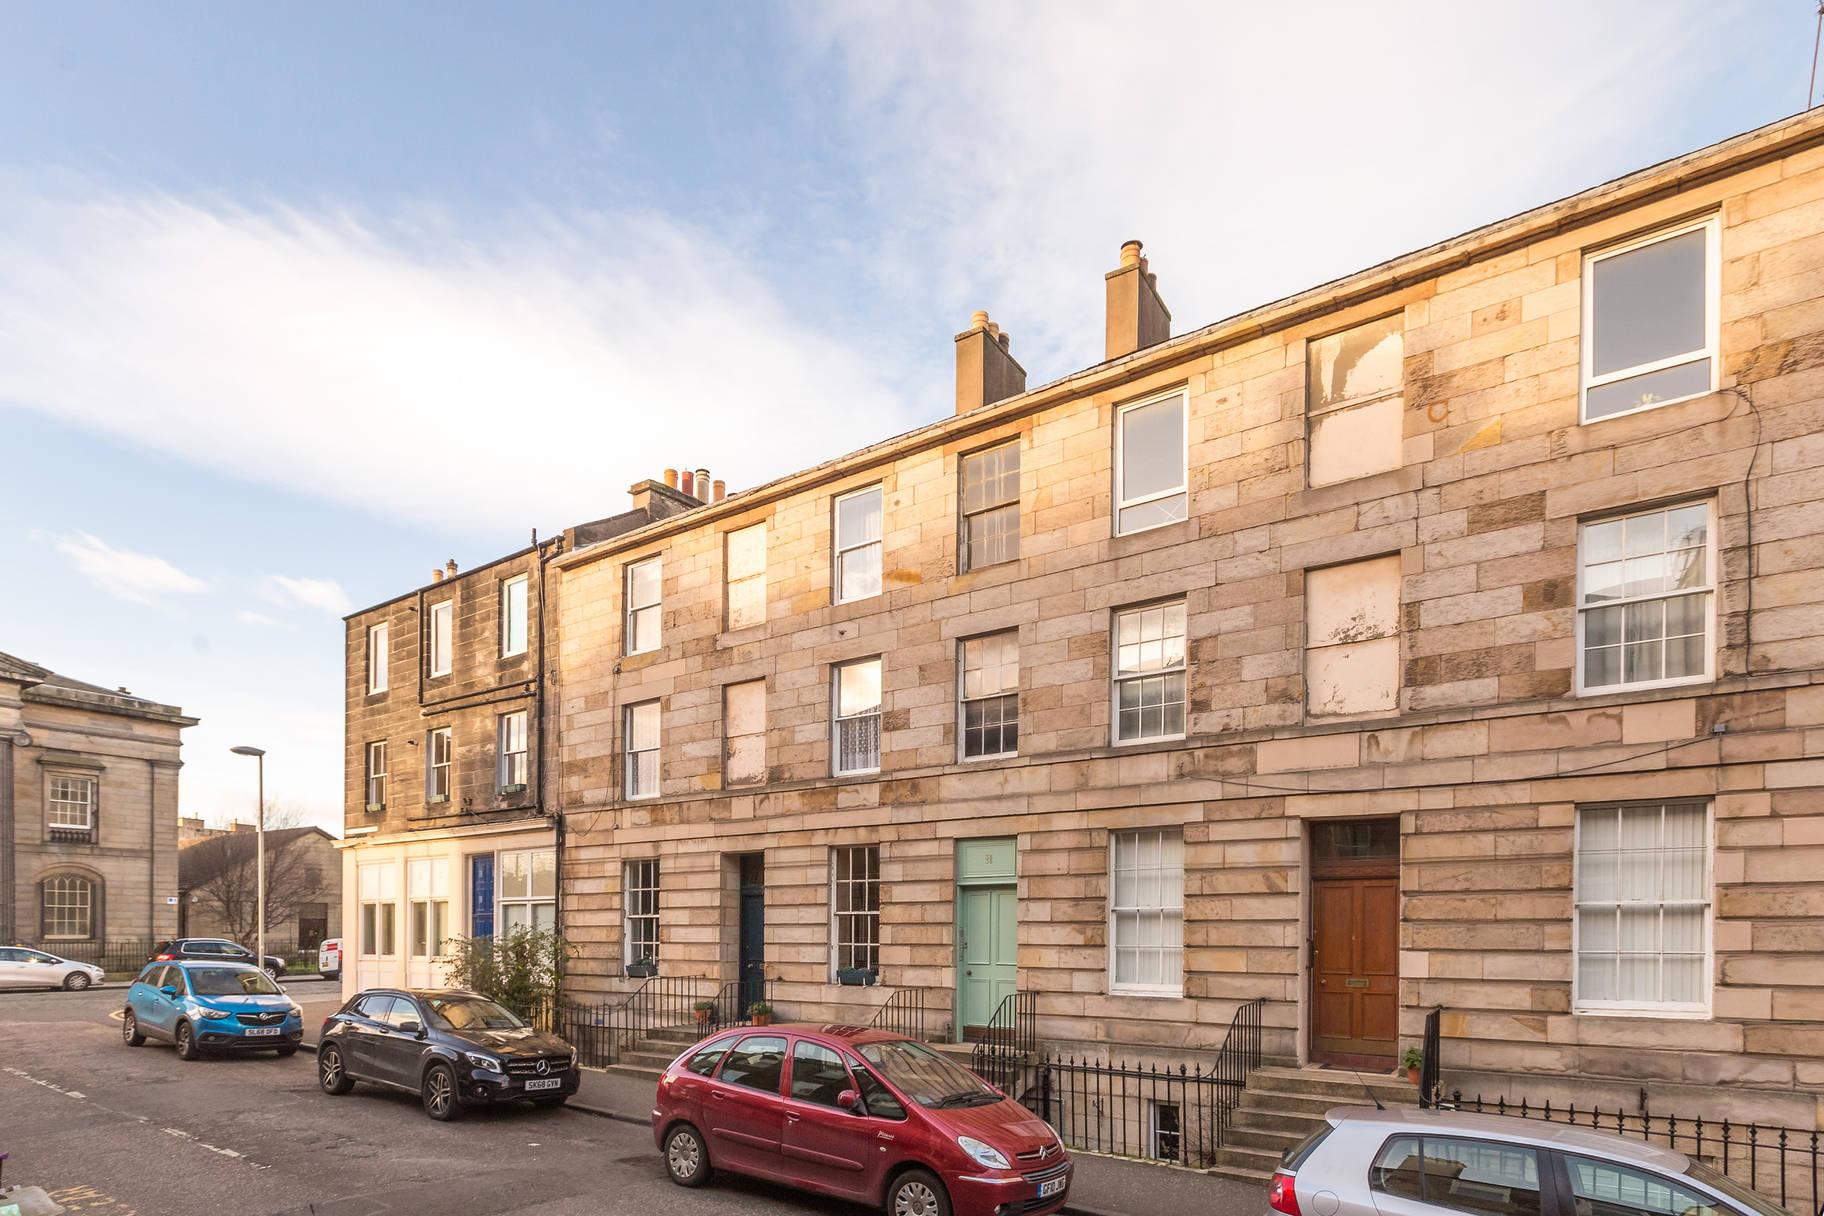 38/1 Prince Regent Street, Edinburgh, EH6 4AT